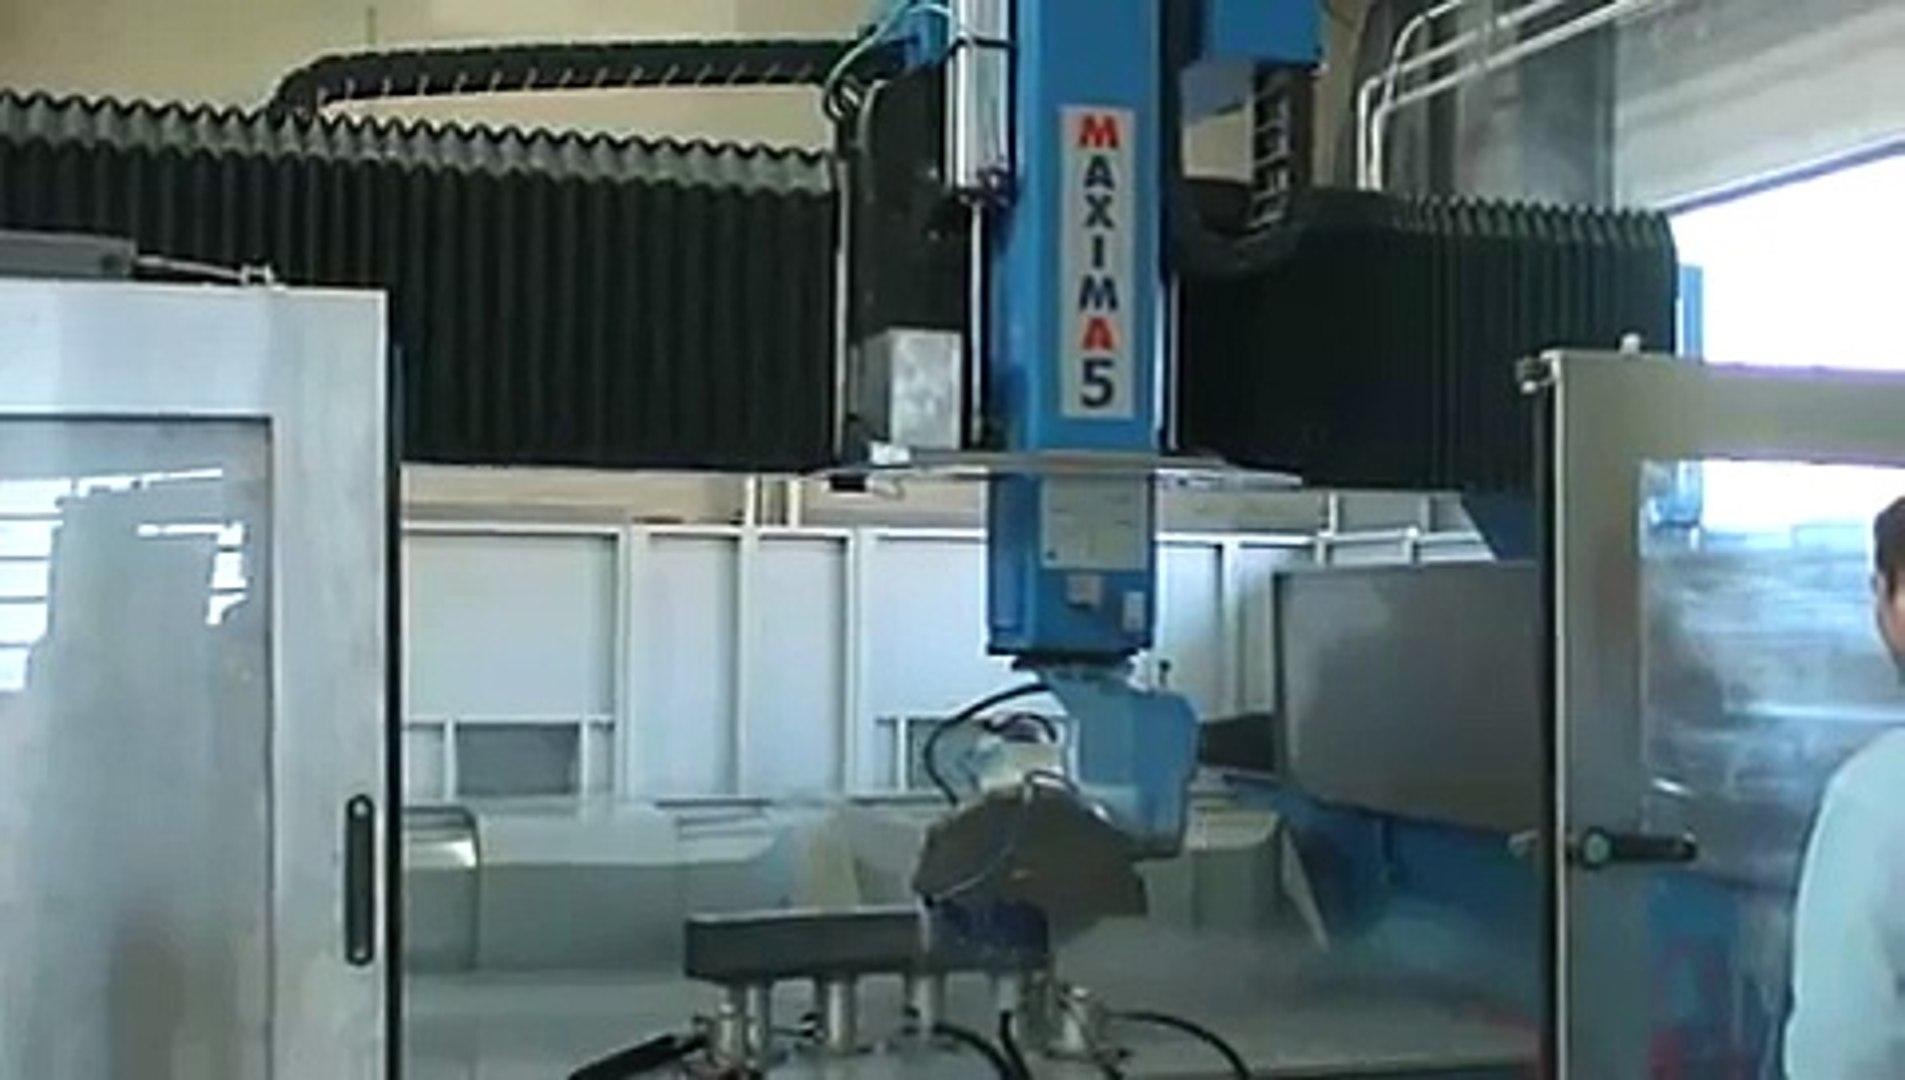 CMS Brembana MAXIMA 5 Axis Profiling with blade